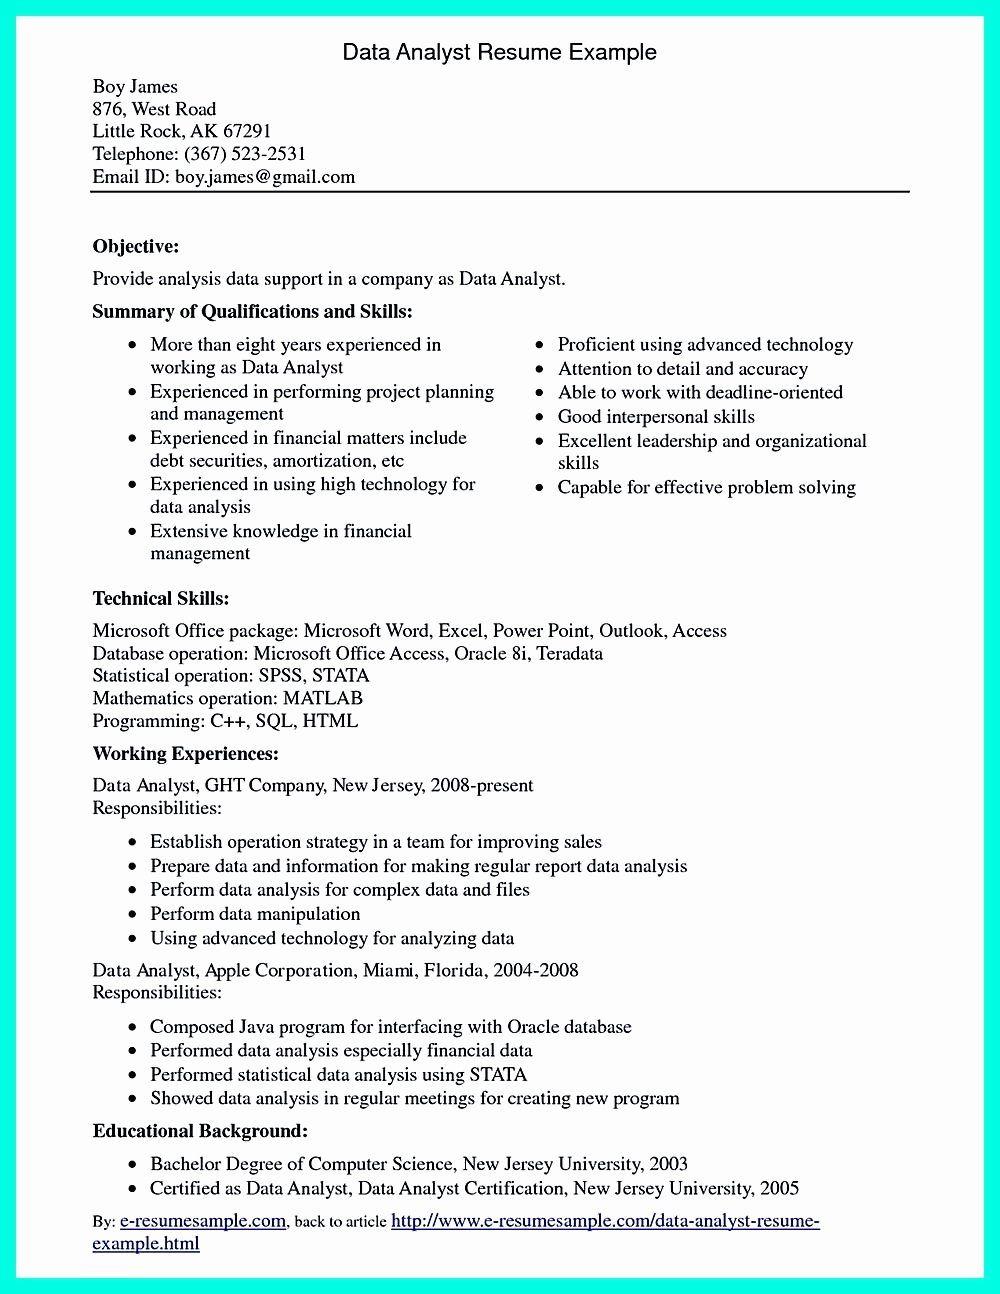 20 Healthcare Data Analyst Resume in 2020 Data analyst